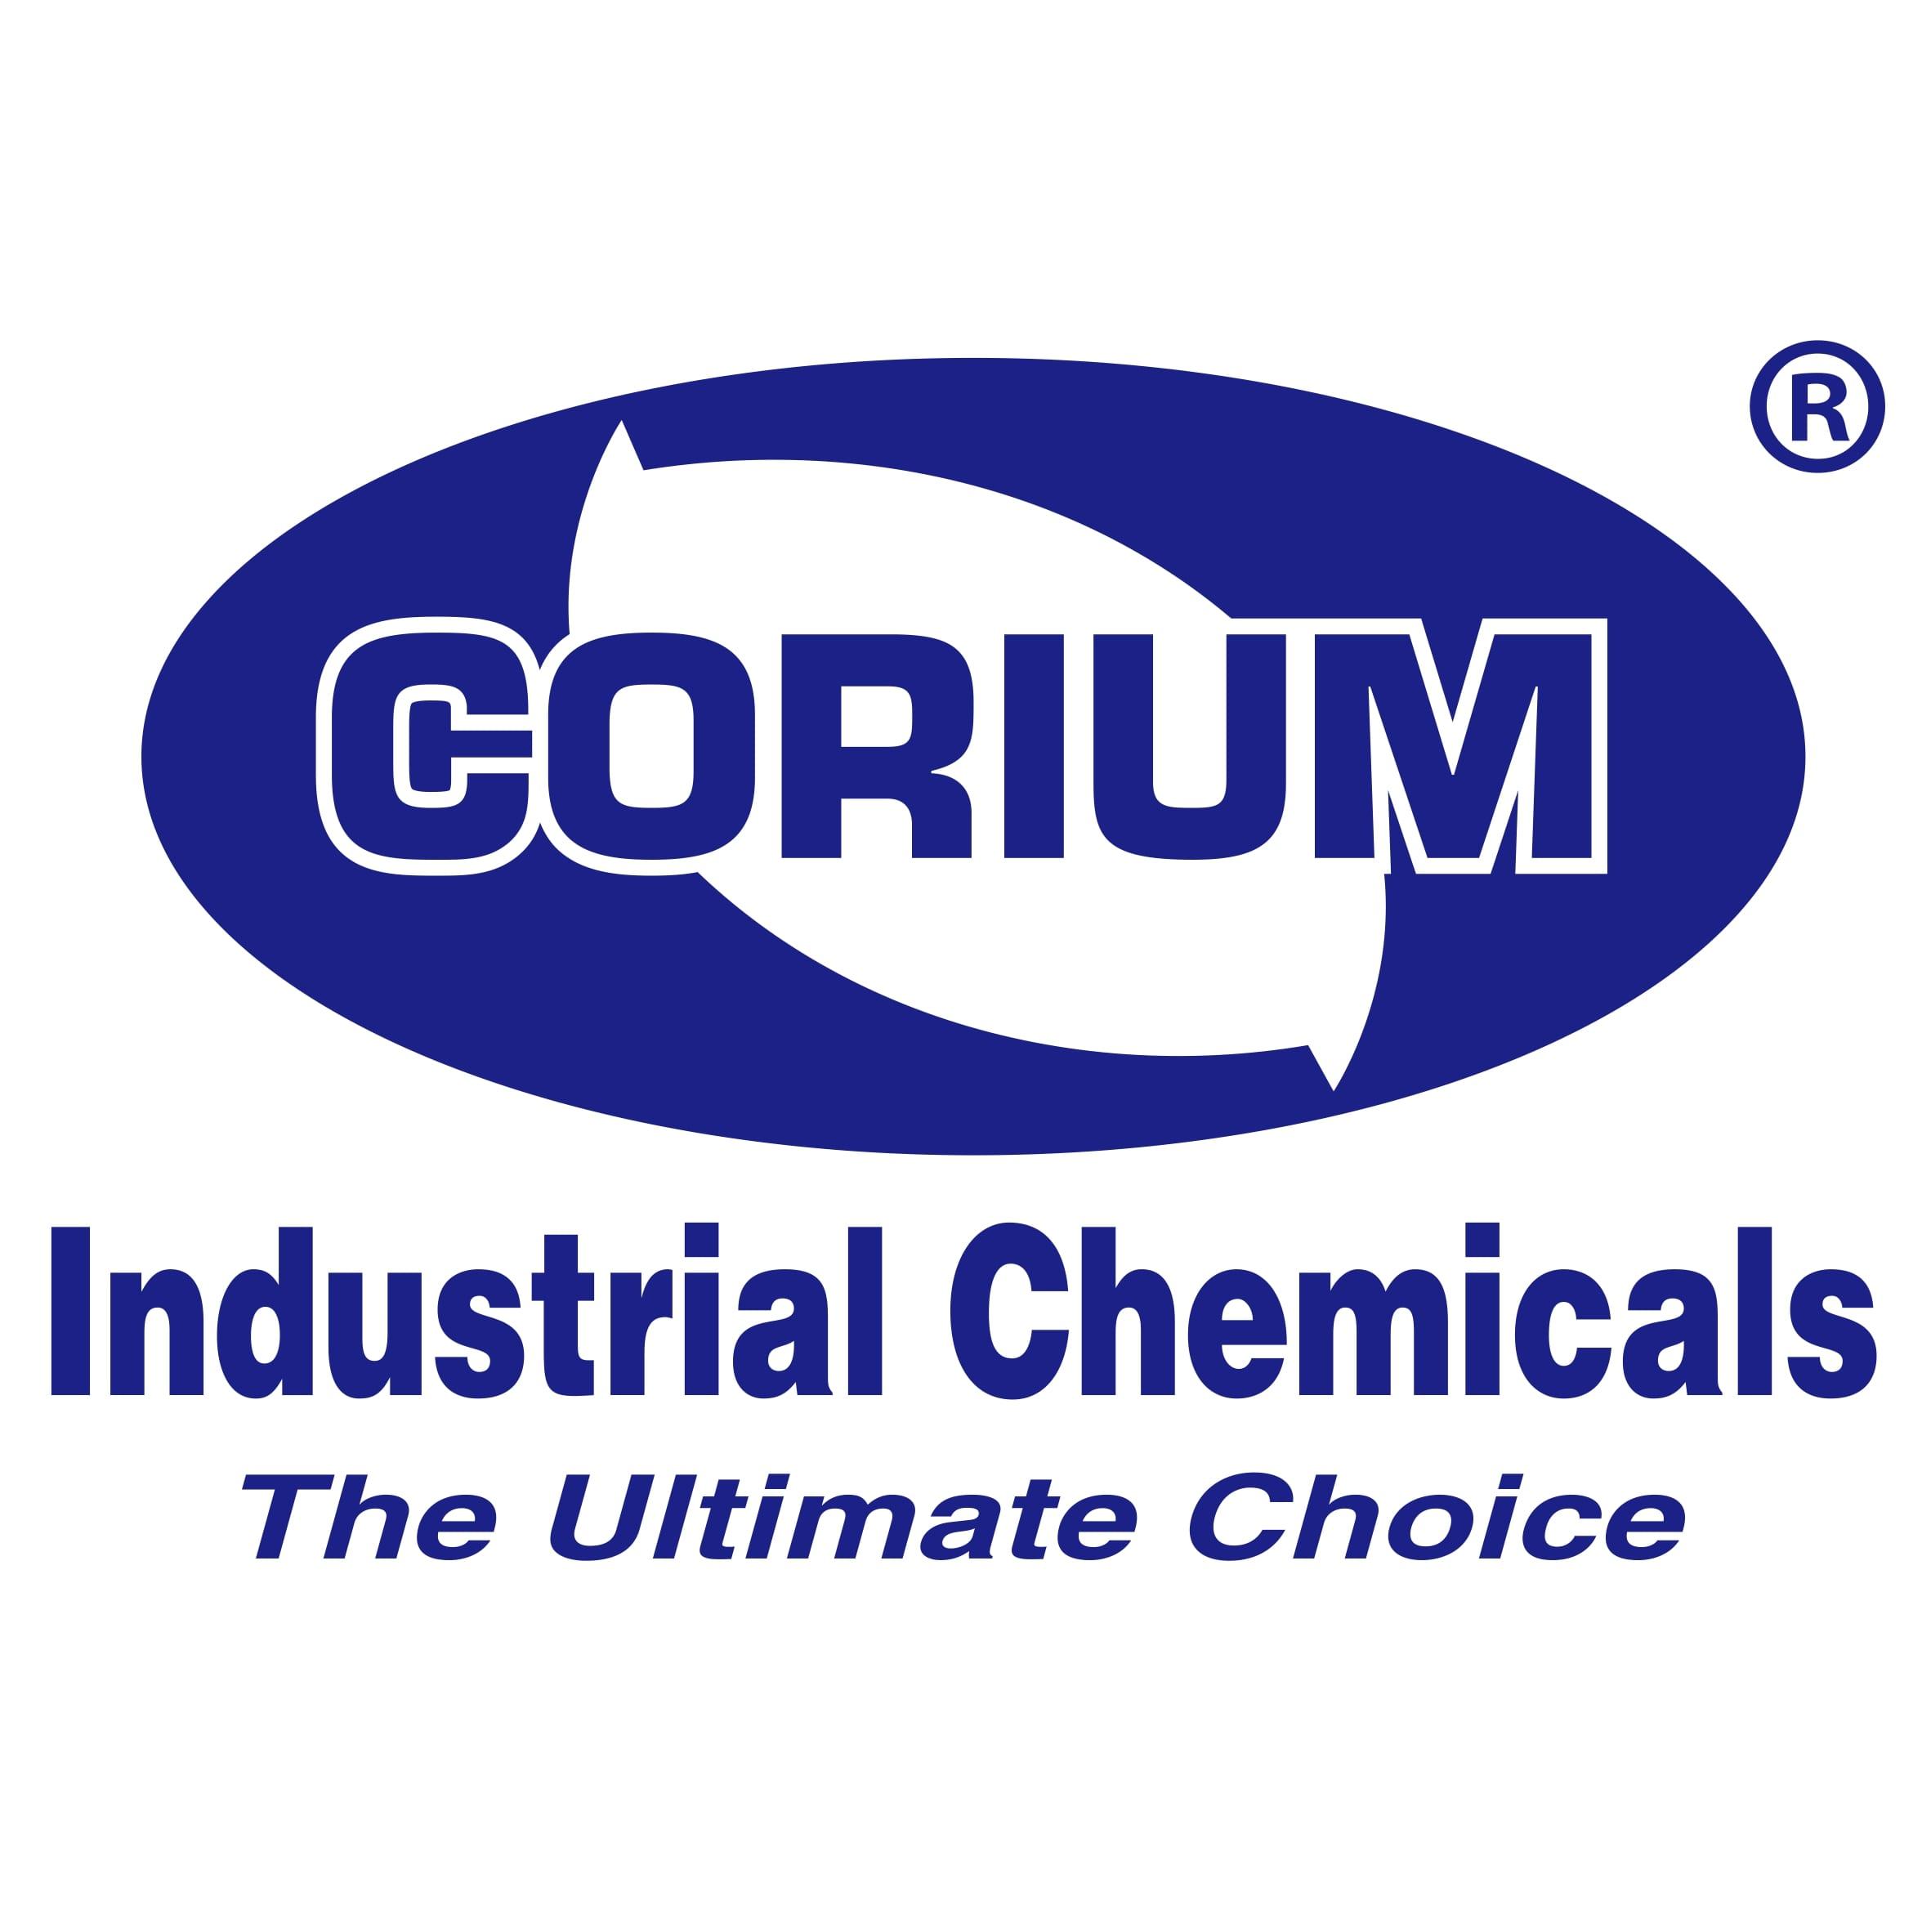 Corium industrial chemicals by supertech services